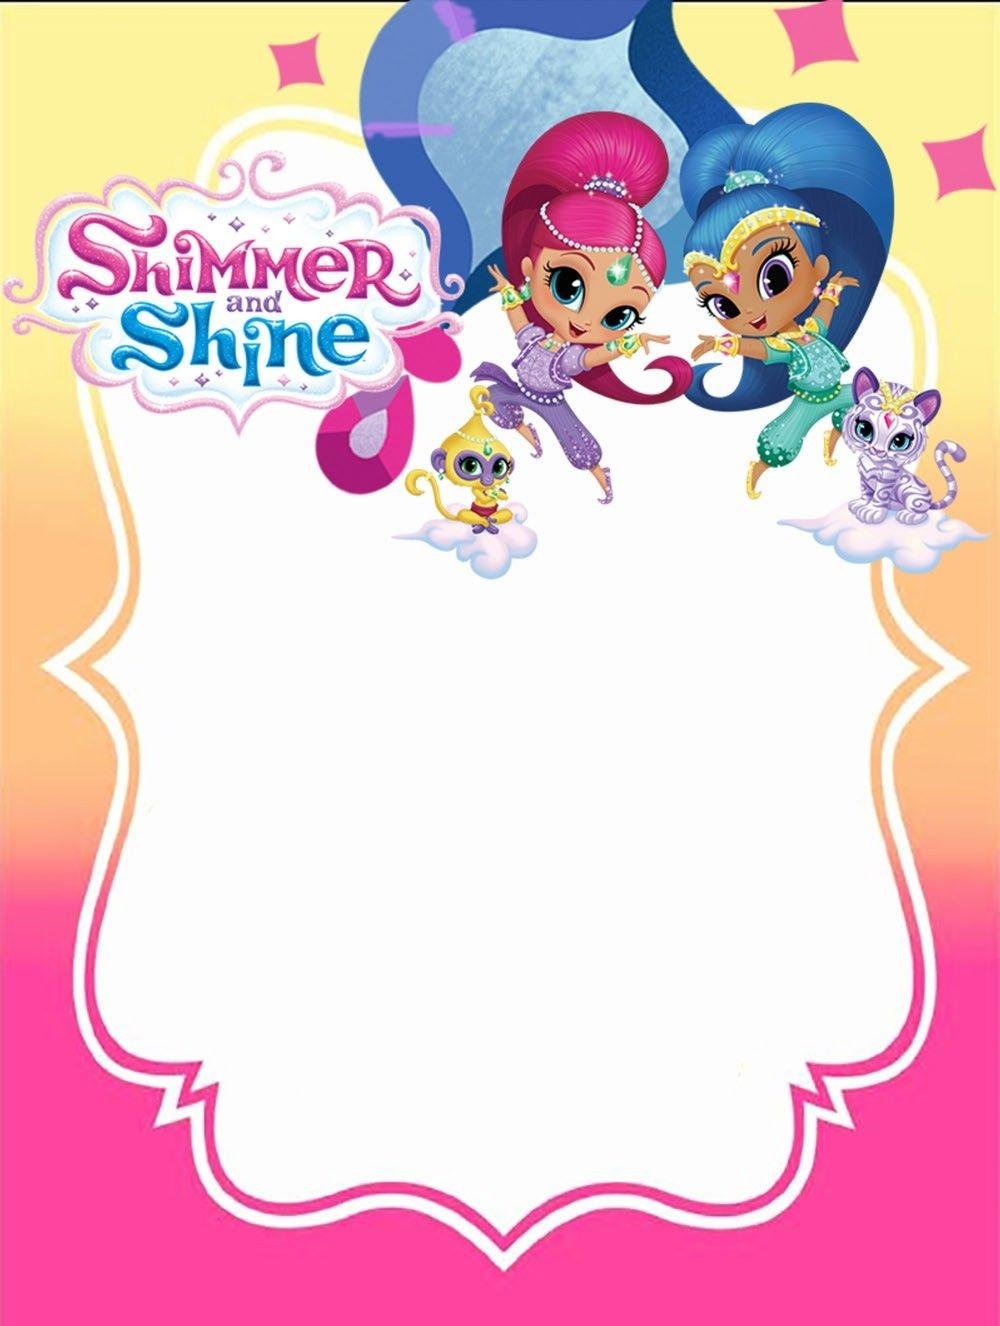 Free Printable Shimmer And Shine Invitation Card | 4Th Birthday In - Shimmer And Shine Free Printables